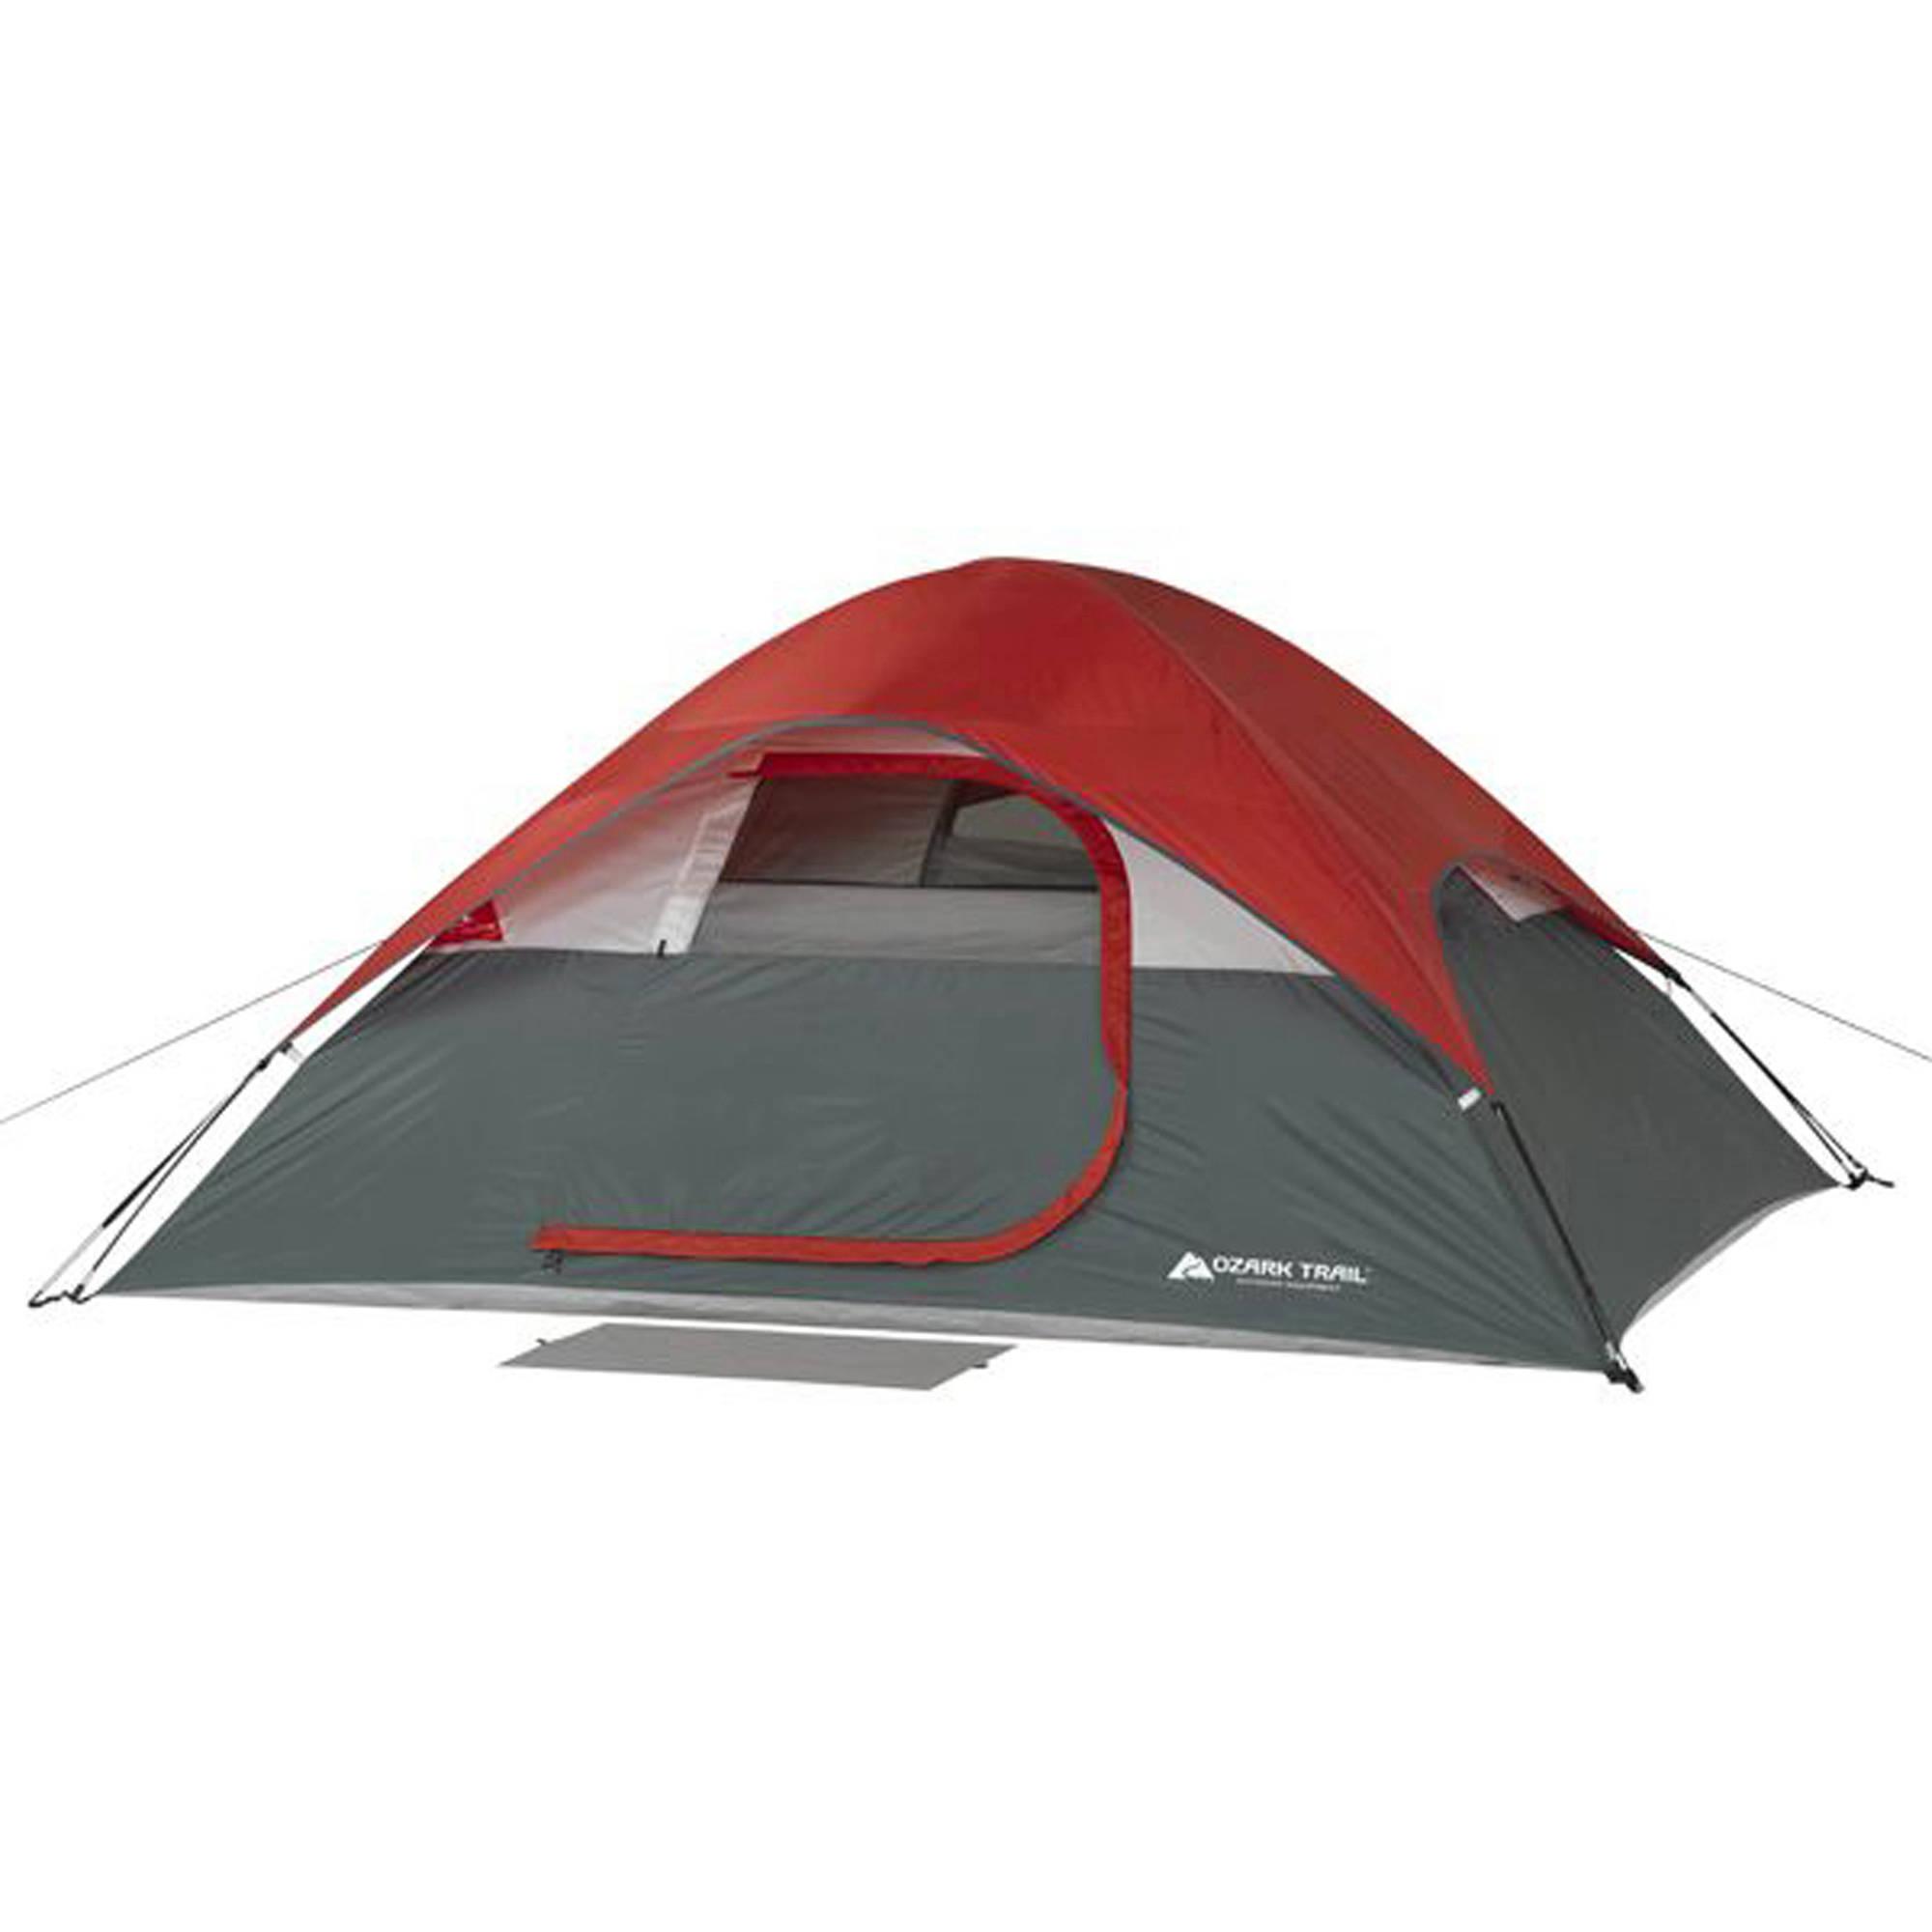 Ozark Trail 9' x 7' Dome Camping Tent, Sleeps 4